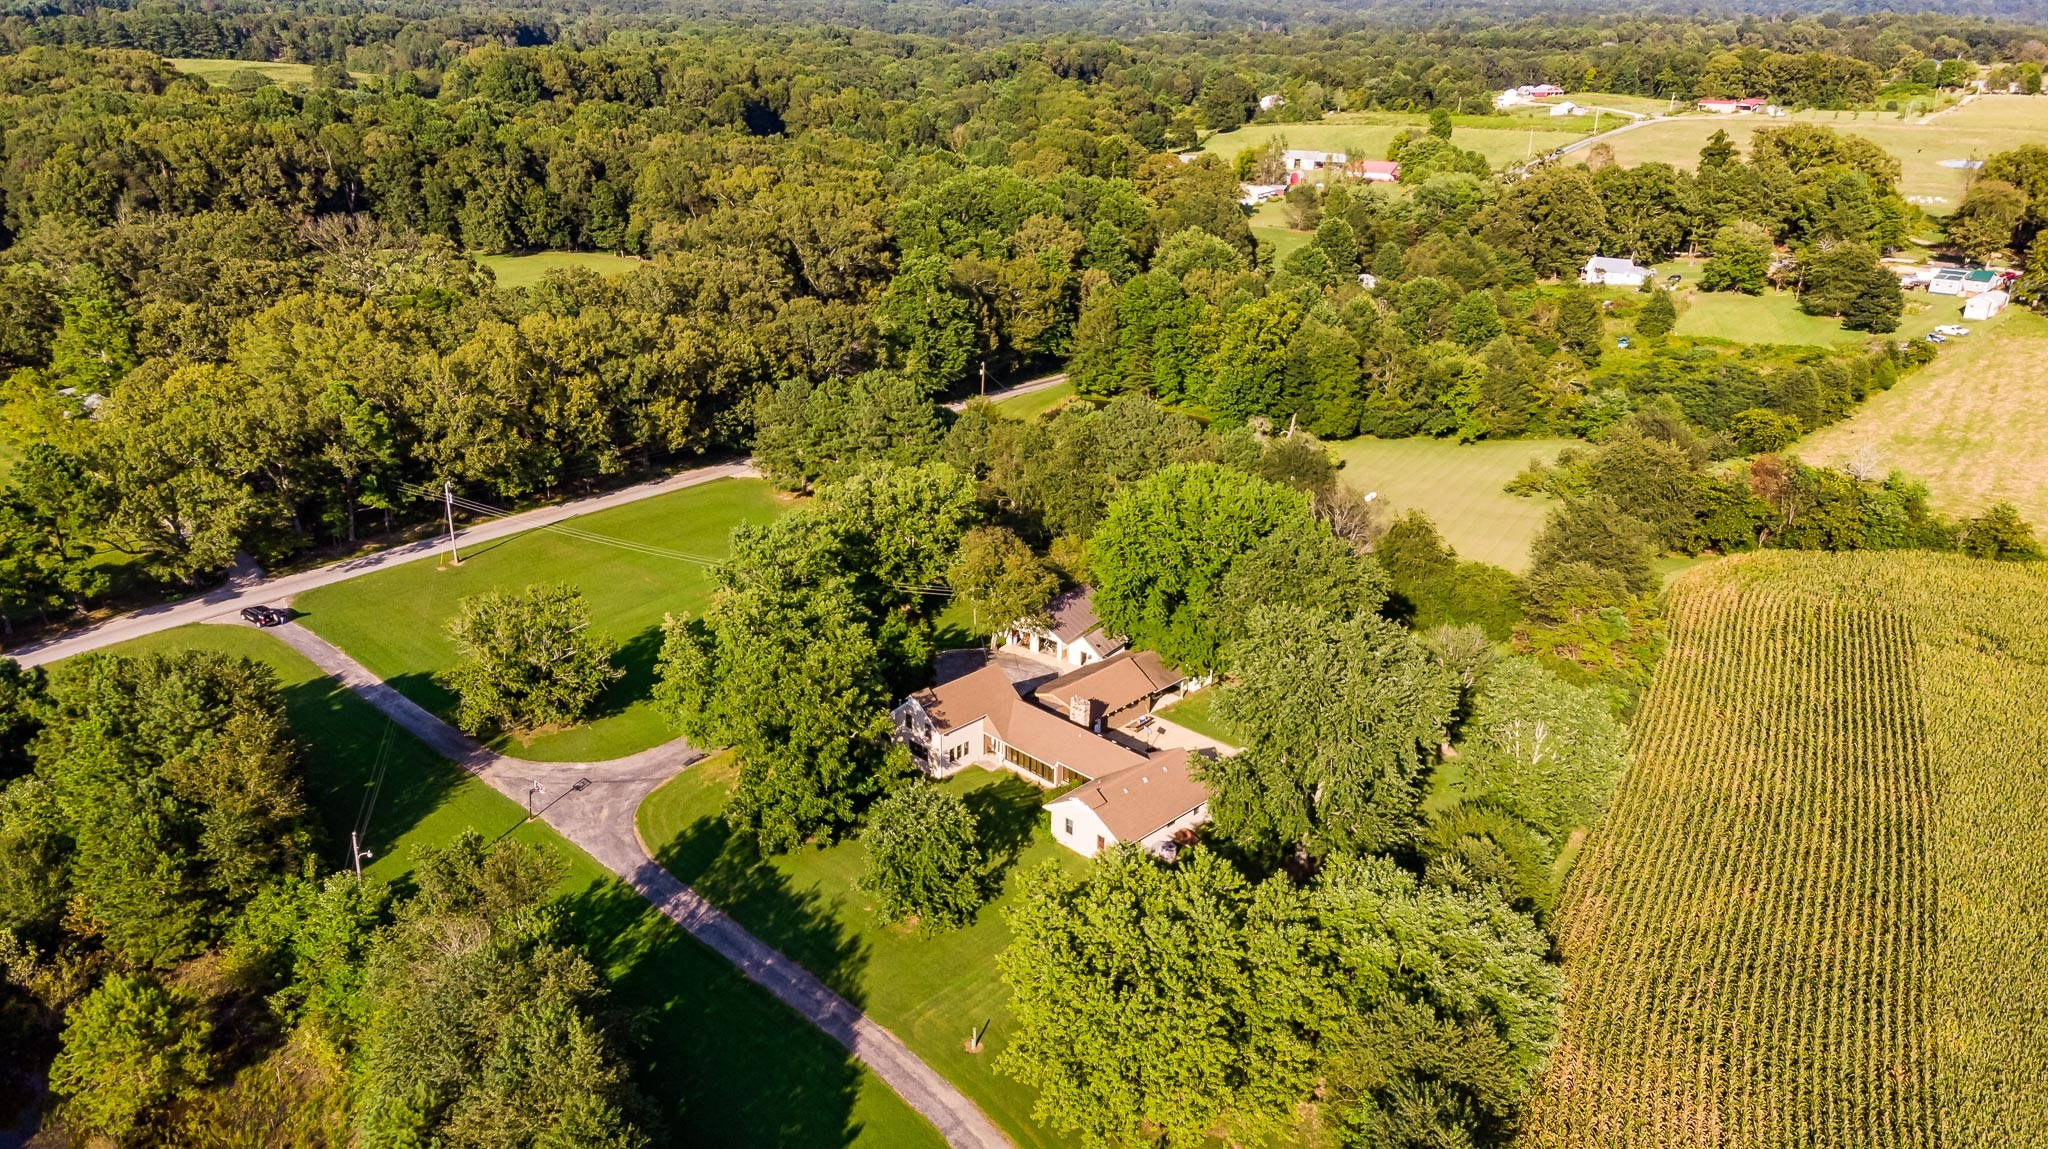 96 Mount Horeb Rd Property Photo - Ethridge, TN real estate listing